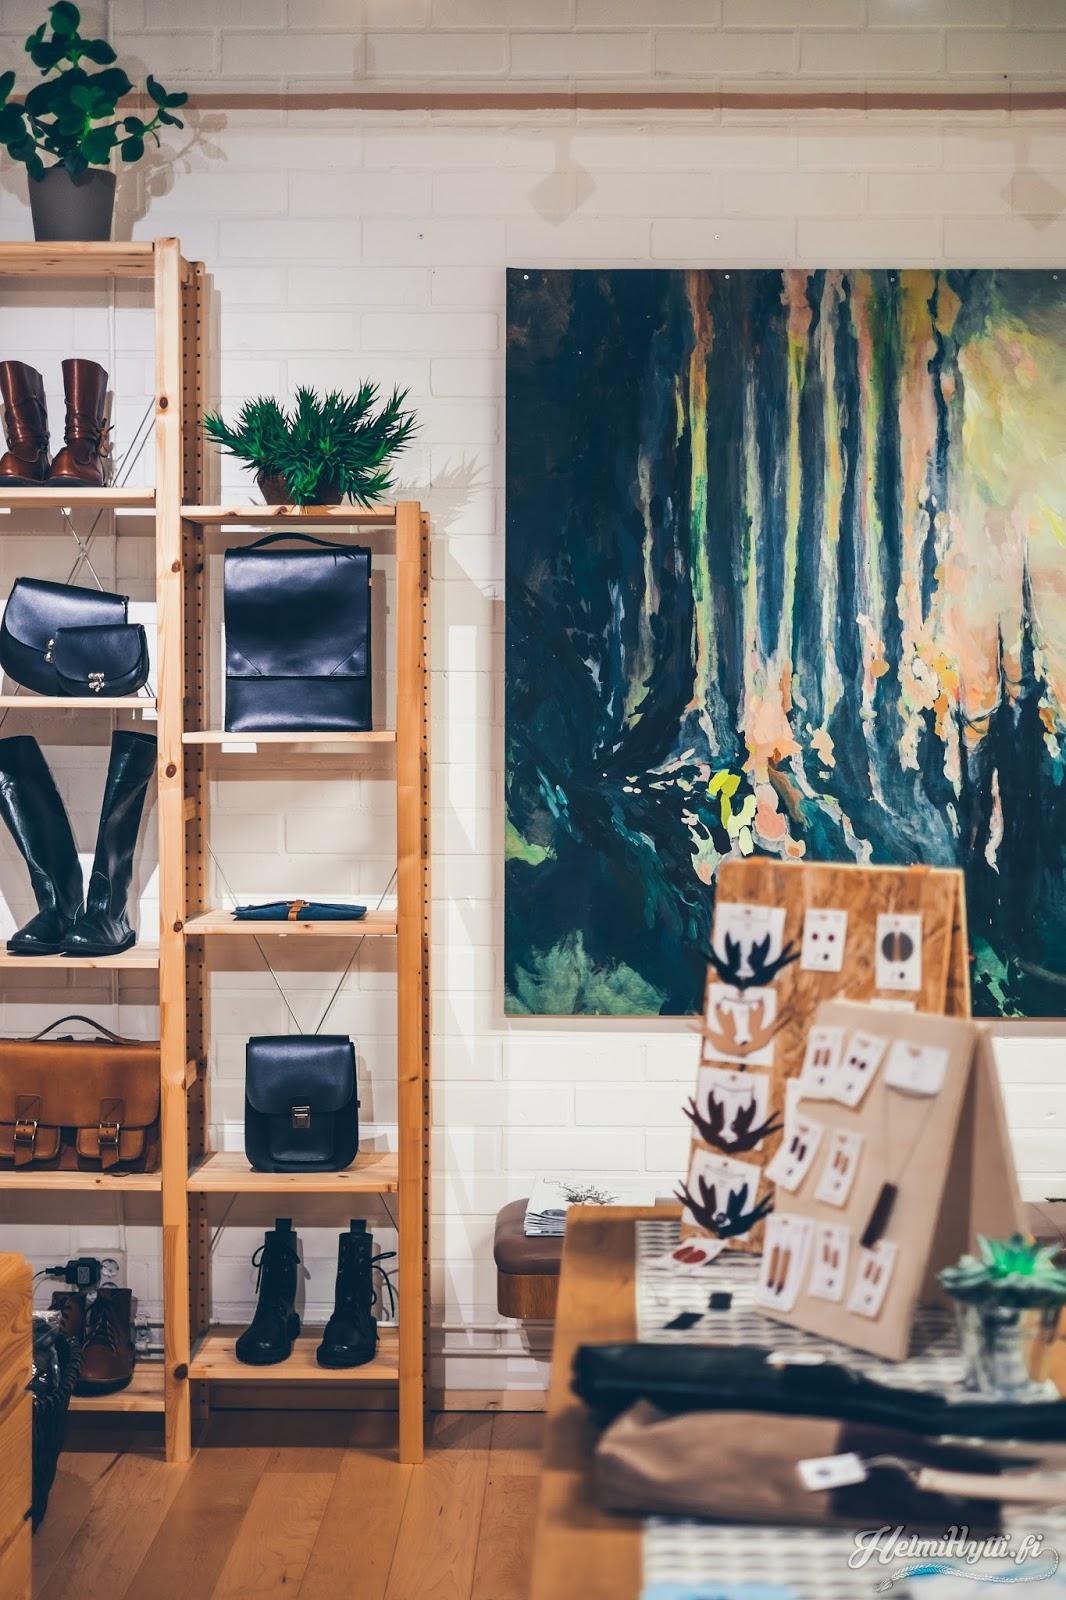 tampere-paras-kivijalkakauppa-kenkapaja-pihka